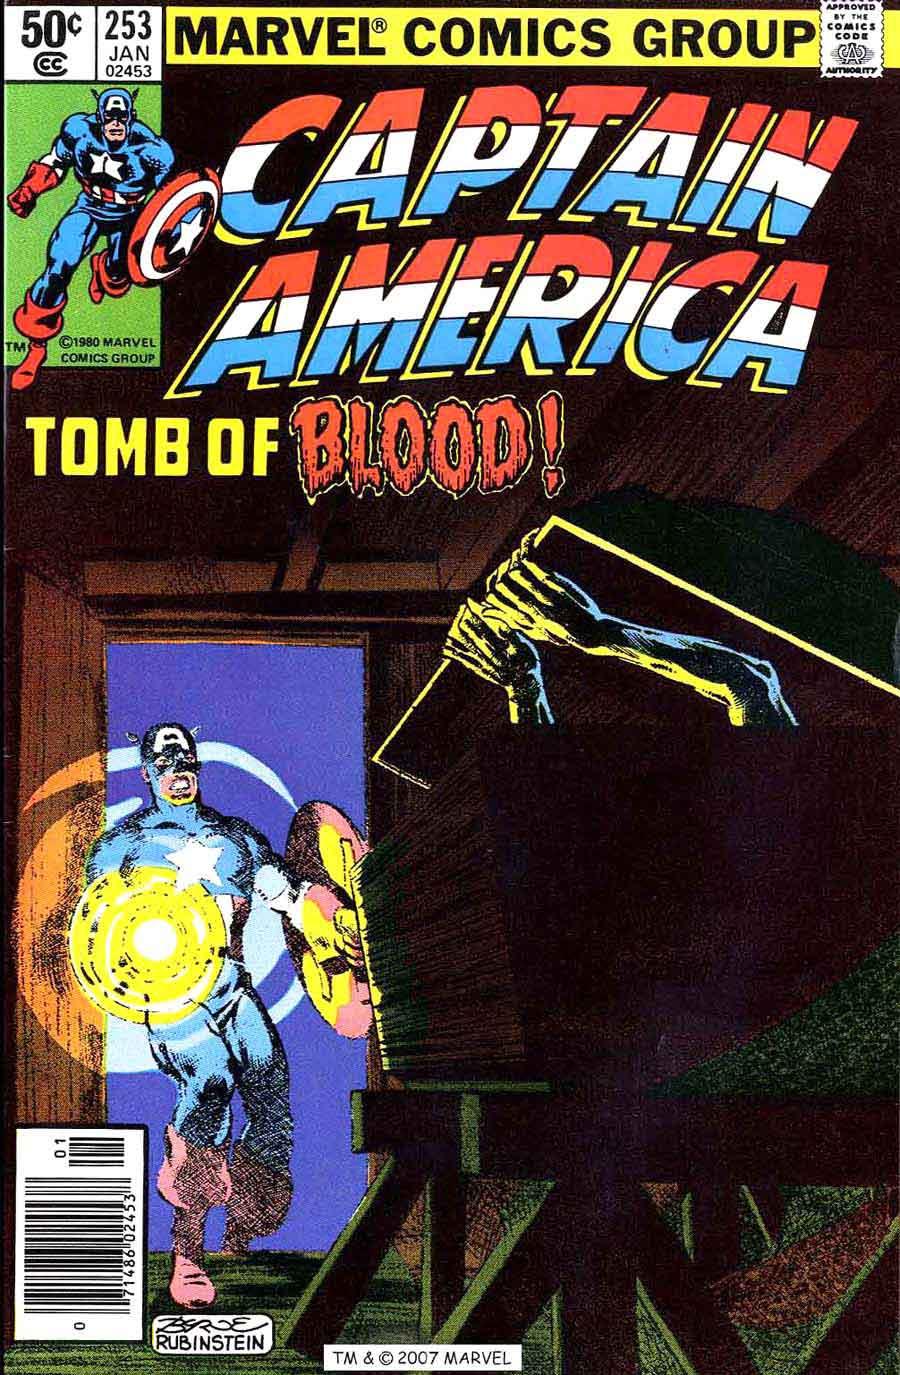 Captain America #253 marvel 1980s bronze age comic book cover art by John Byrne